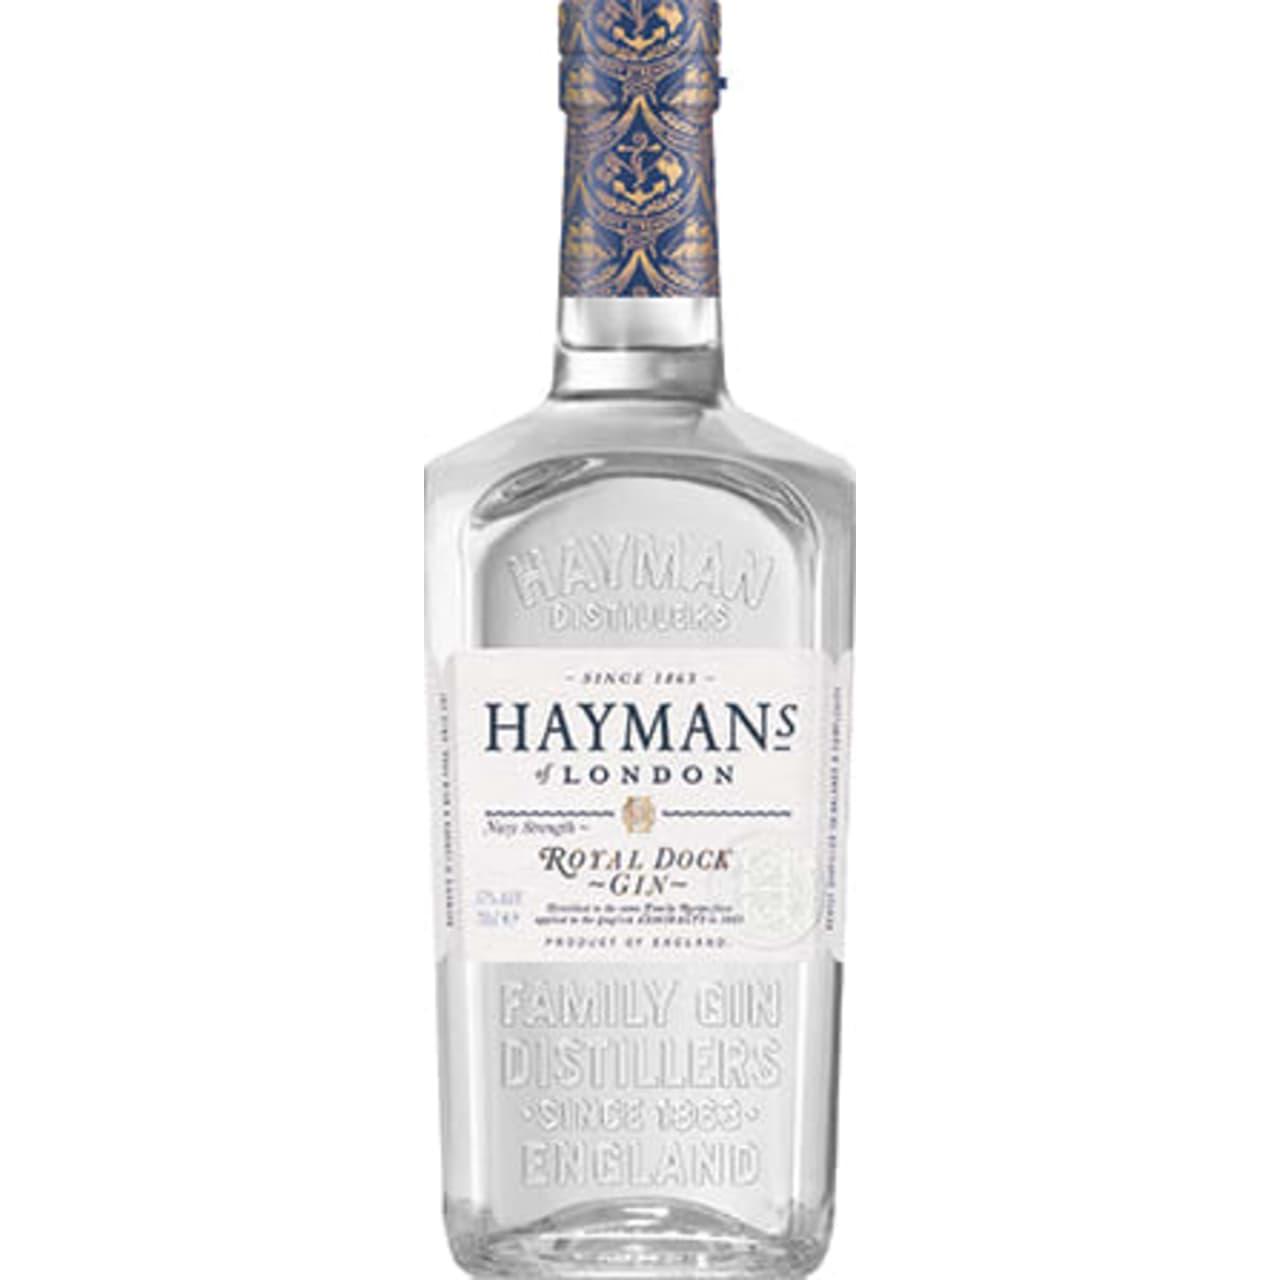 Product Image - Hayman's Royal Dock Navy Strength Gin